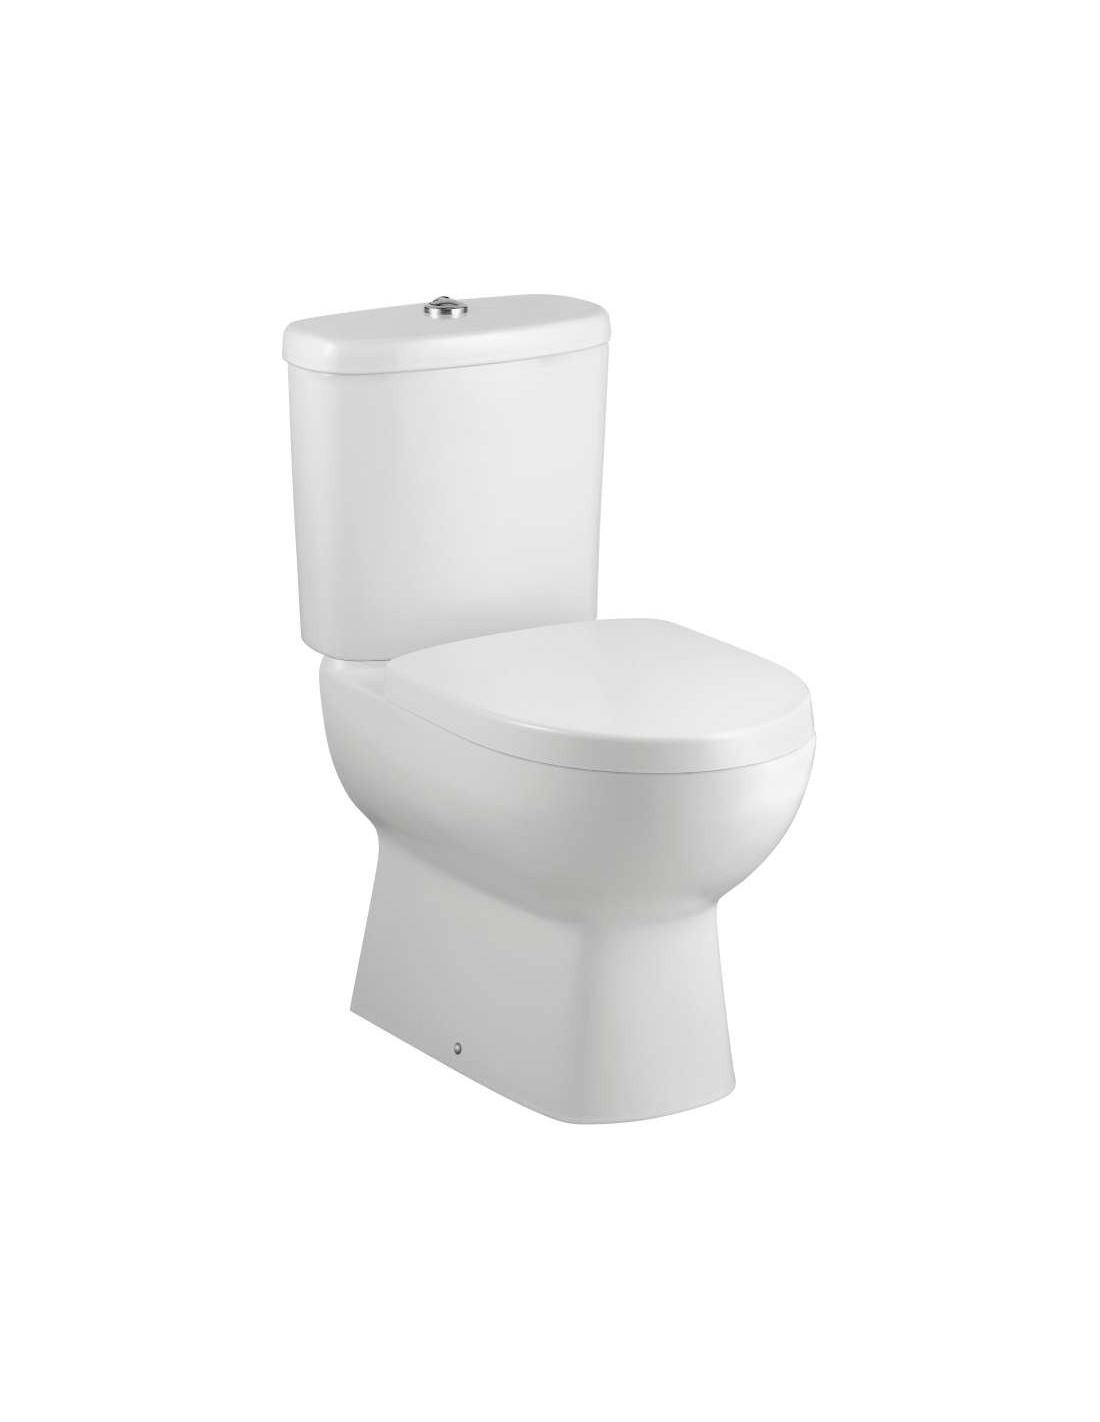 toilet seat jacob delafon odeon up panache tapadelwater. Black Bedroom Furniture Sets. Home Design Ideas